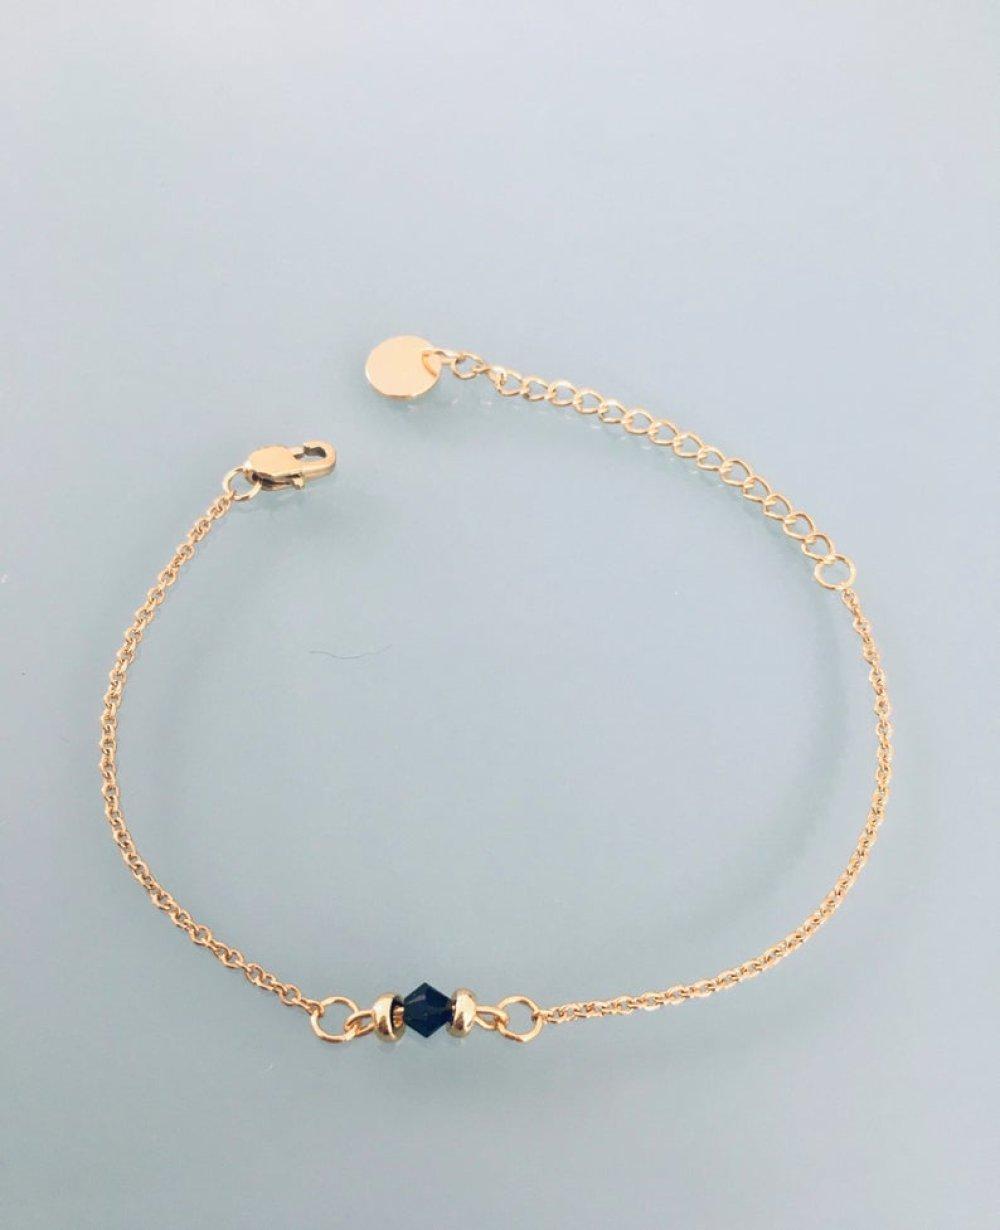 Bracelet femme gourmette pierre naturelle Swarovski et perles Heishi plaqué or 24 k